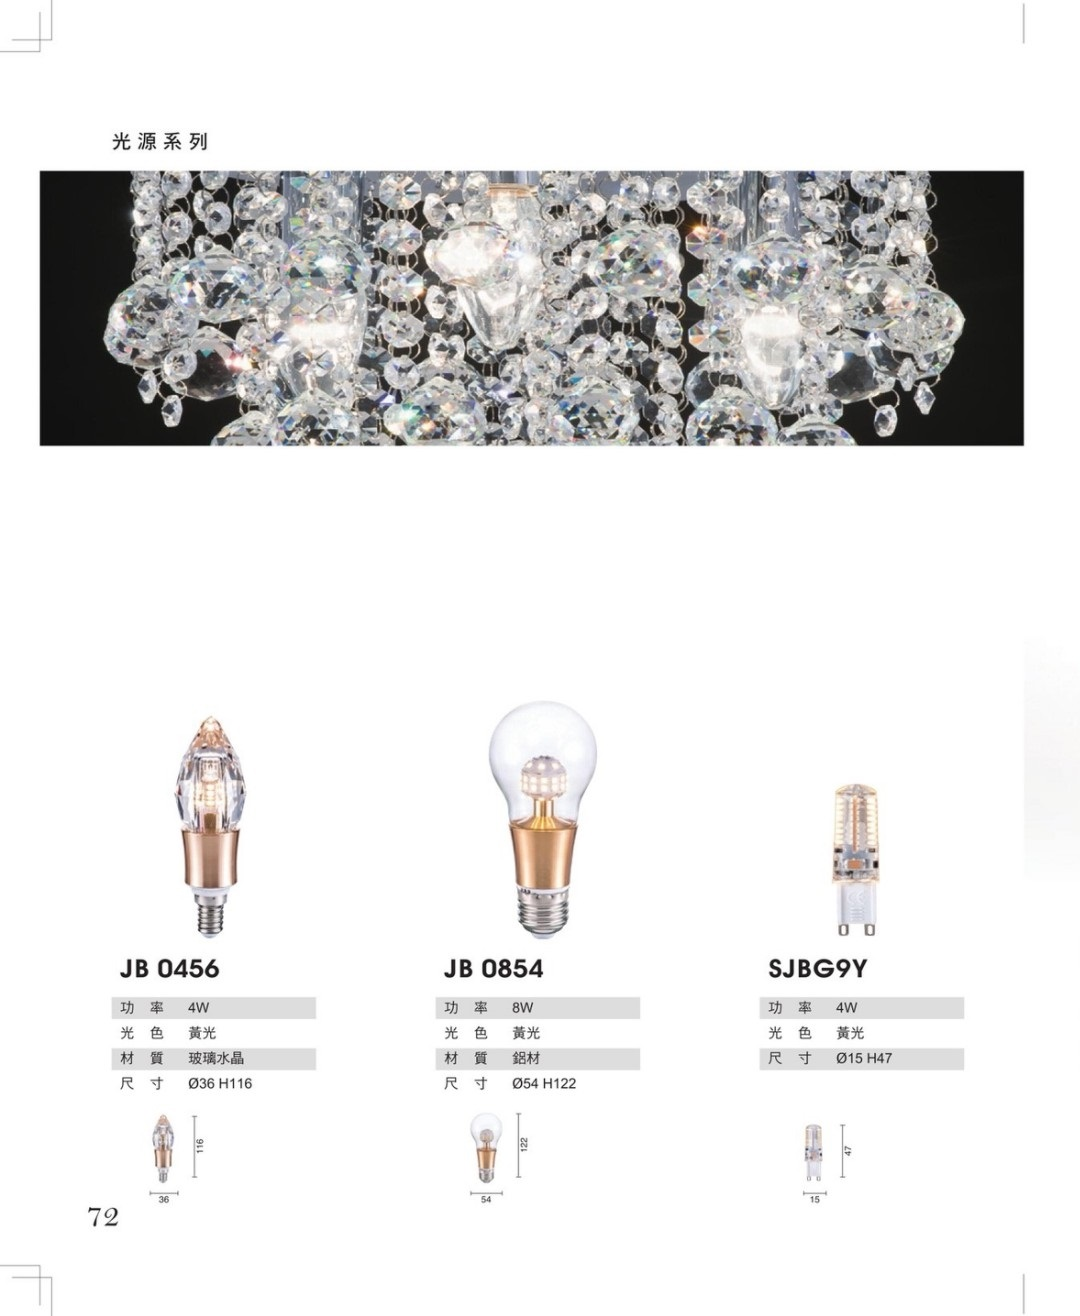 JBR LED